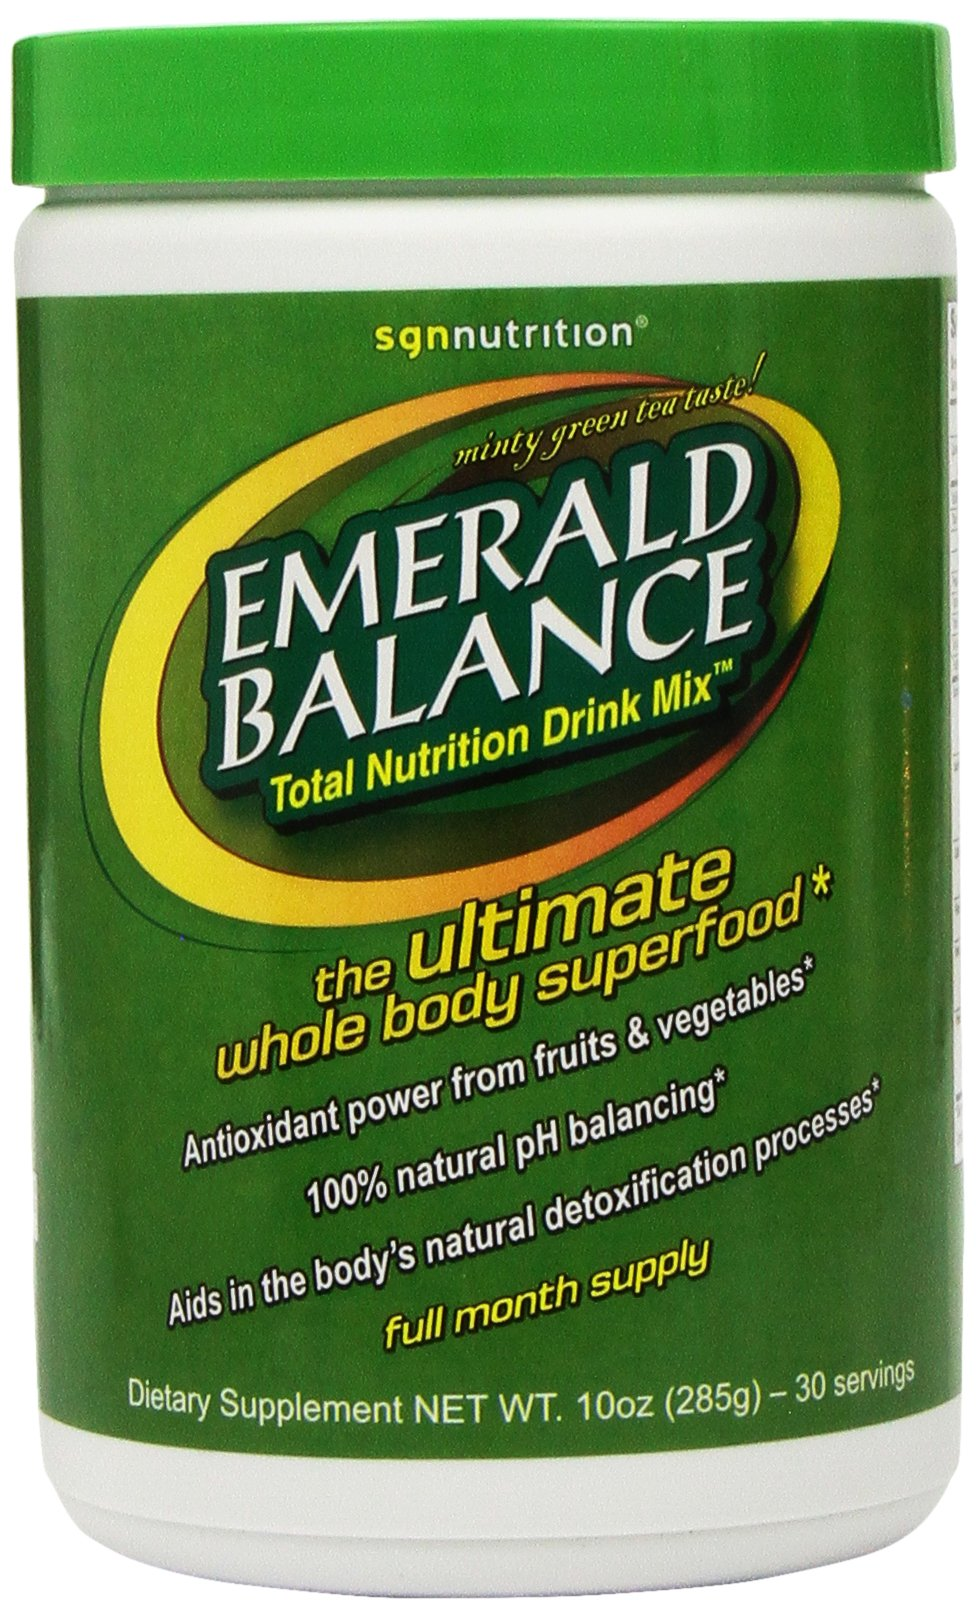 Spirit Garden Nutrition Emerald Balance Total Nutrition Drink Mix, 10-Ounce Canister